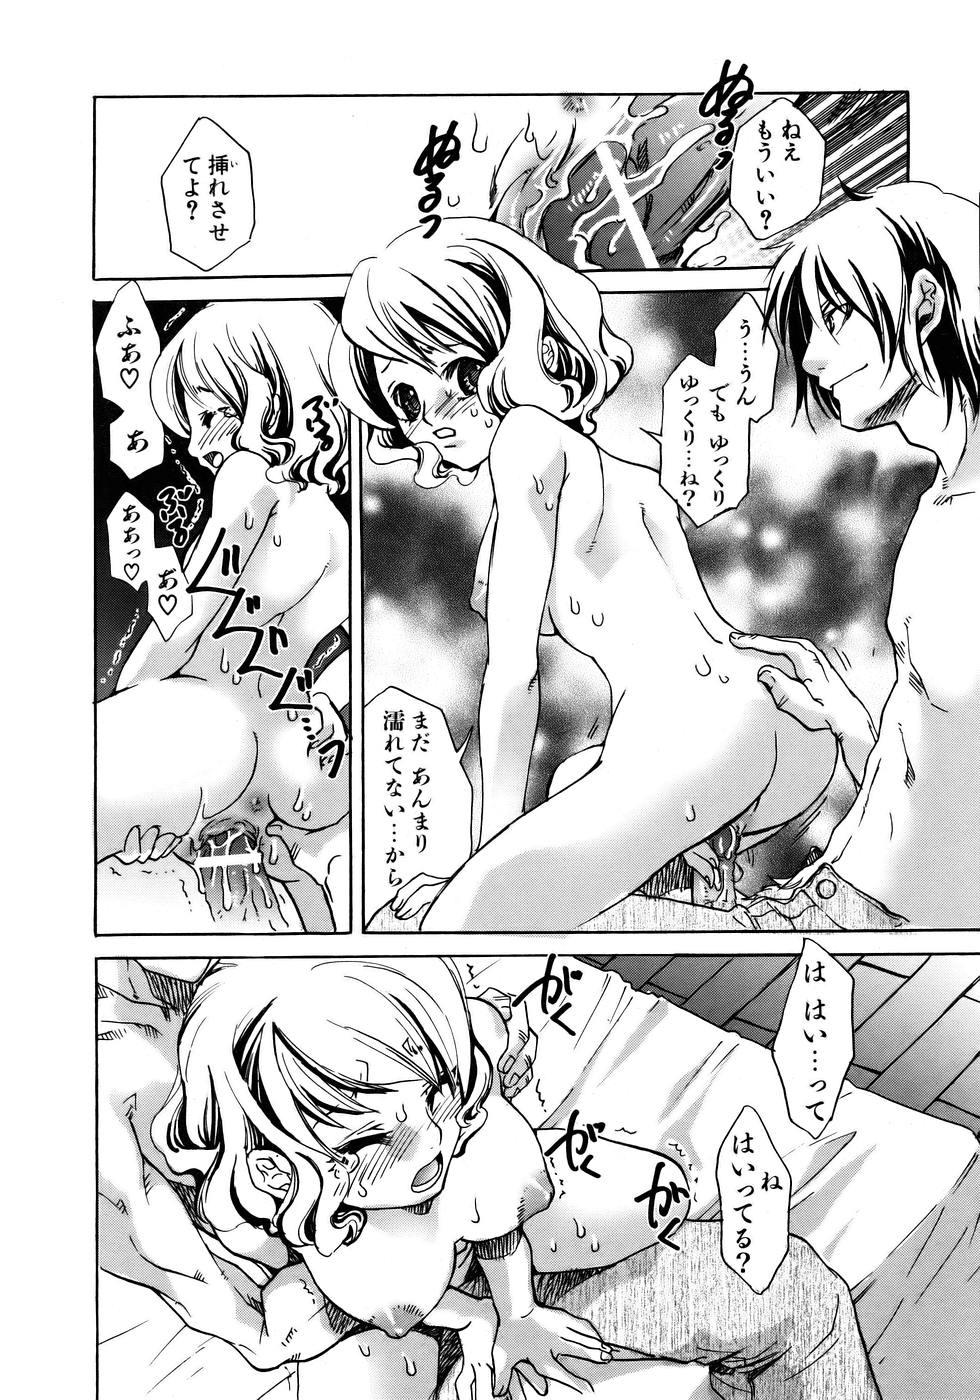 COMIC AUN 2005-12 Vol. 115 149